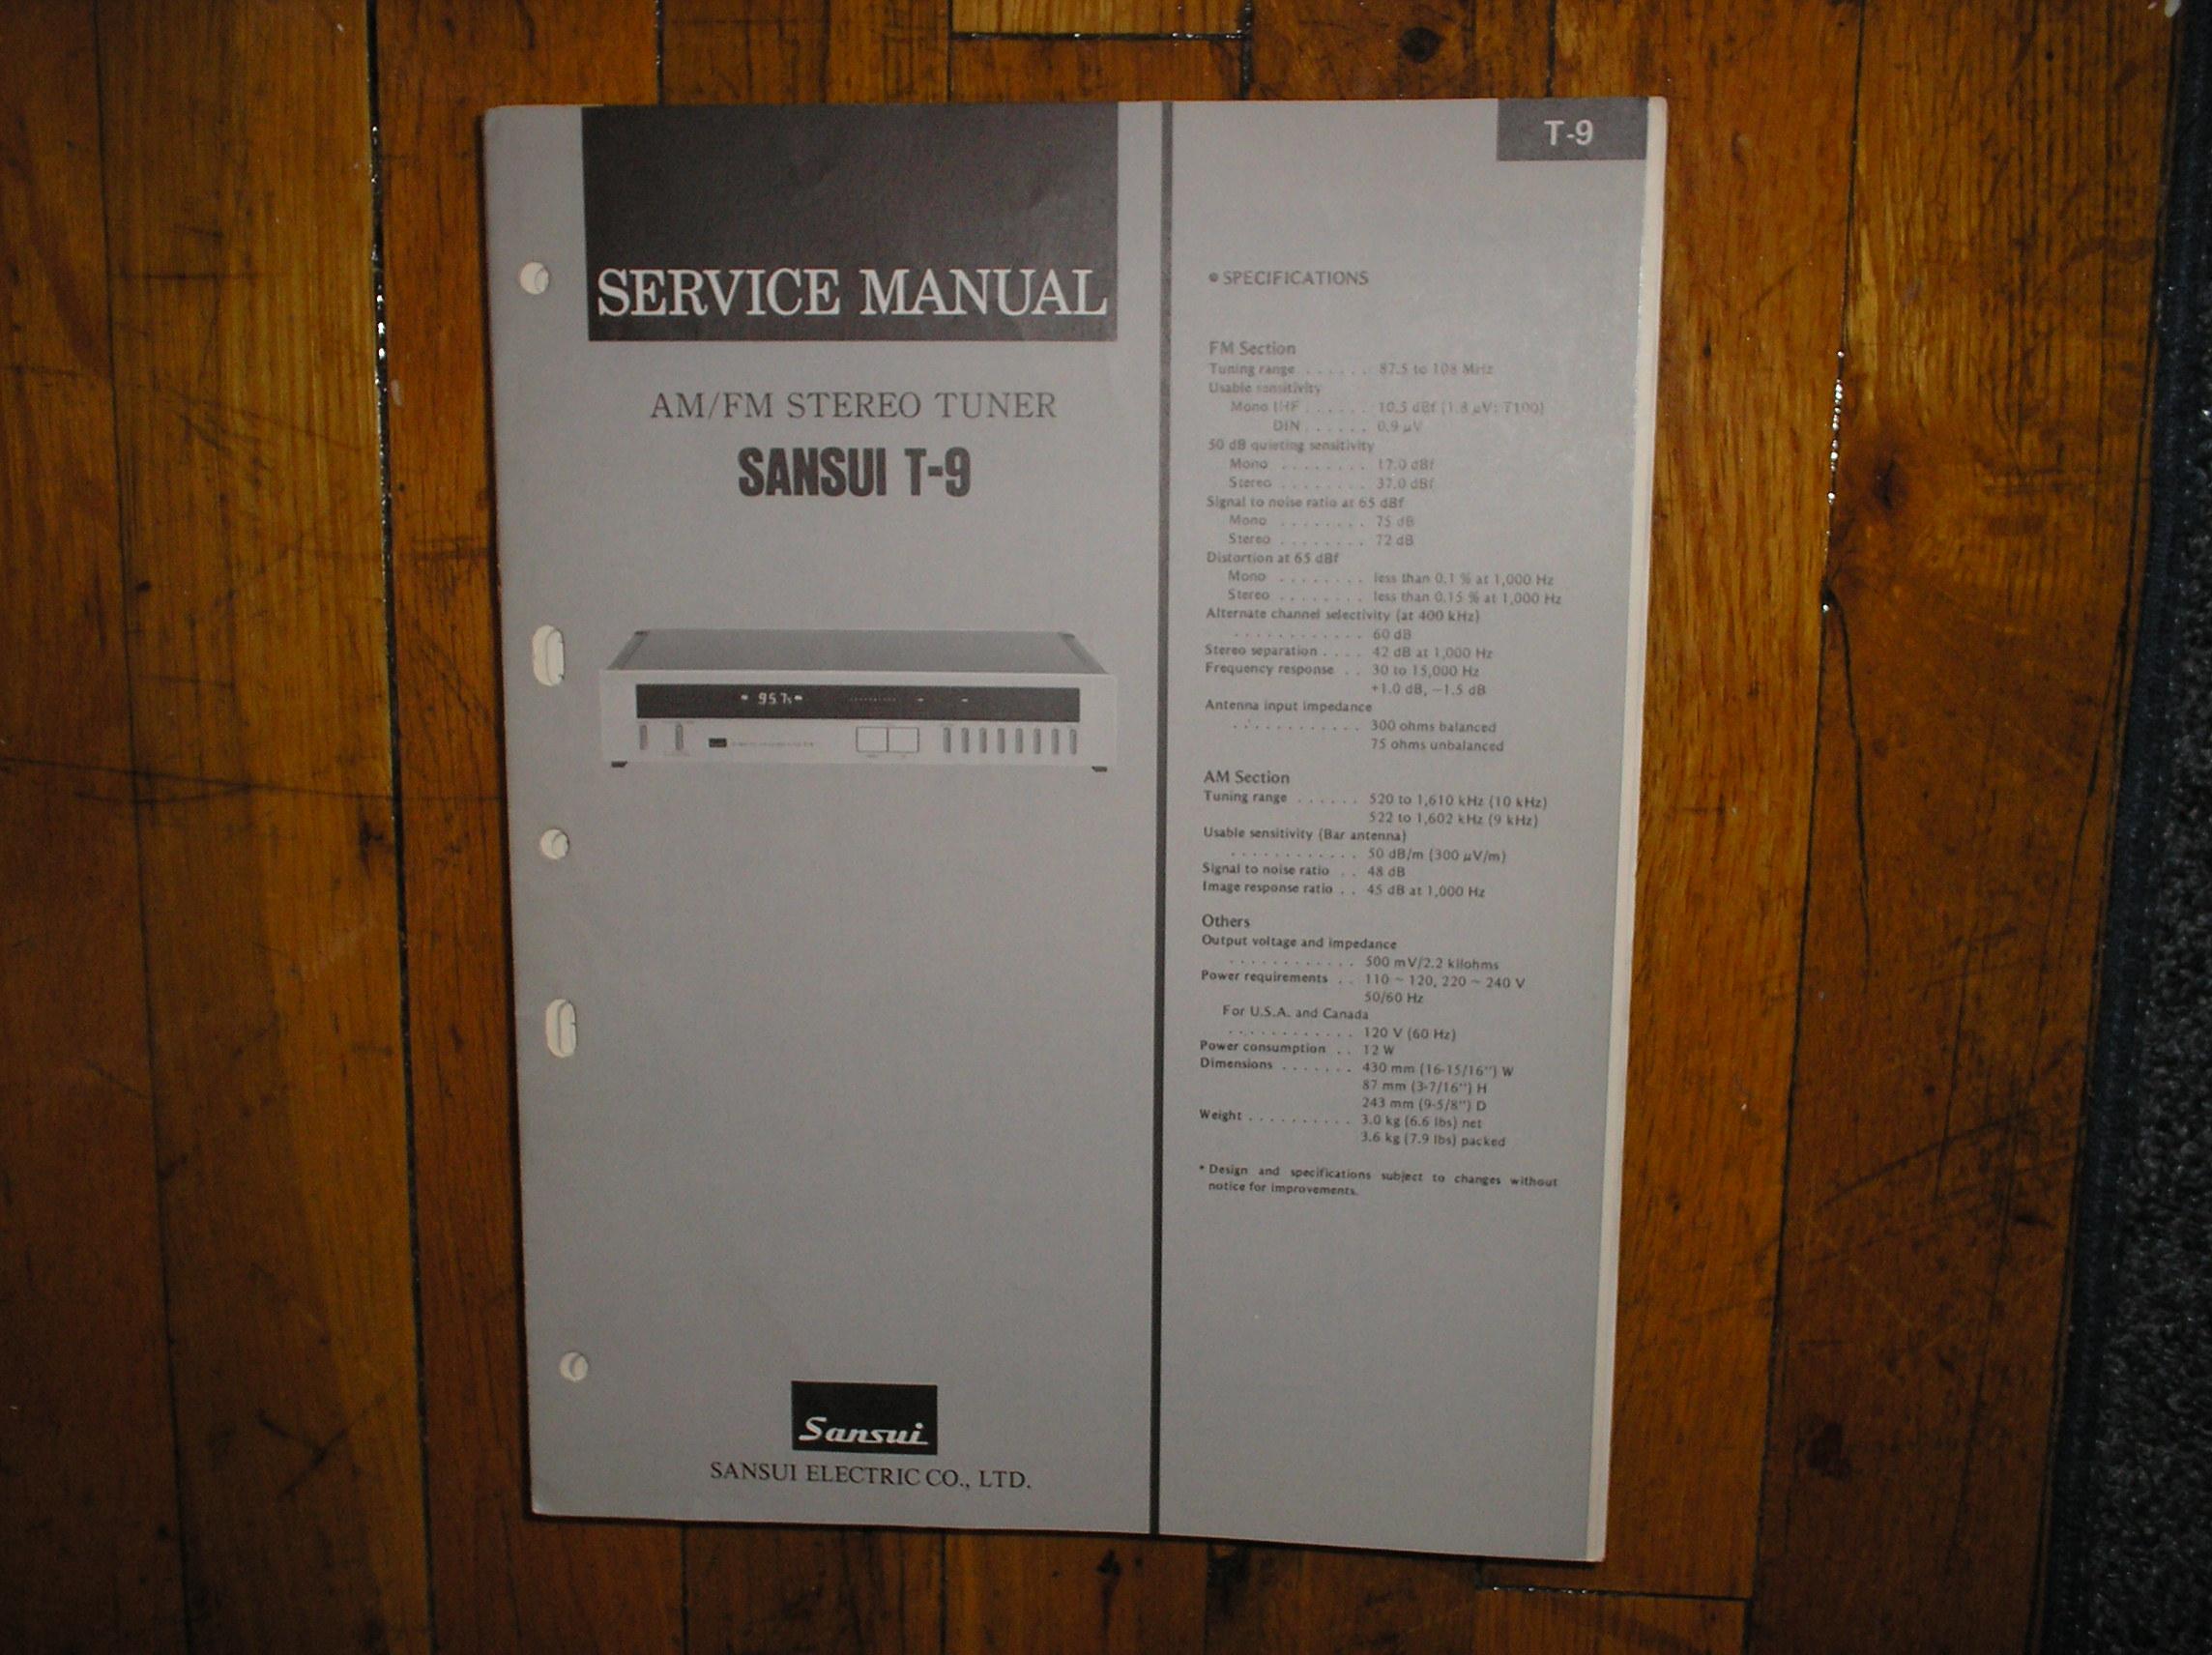 T-9 Tuner Service Manual